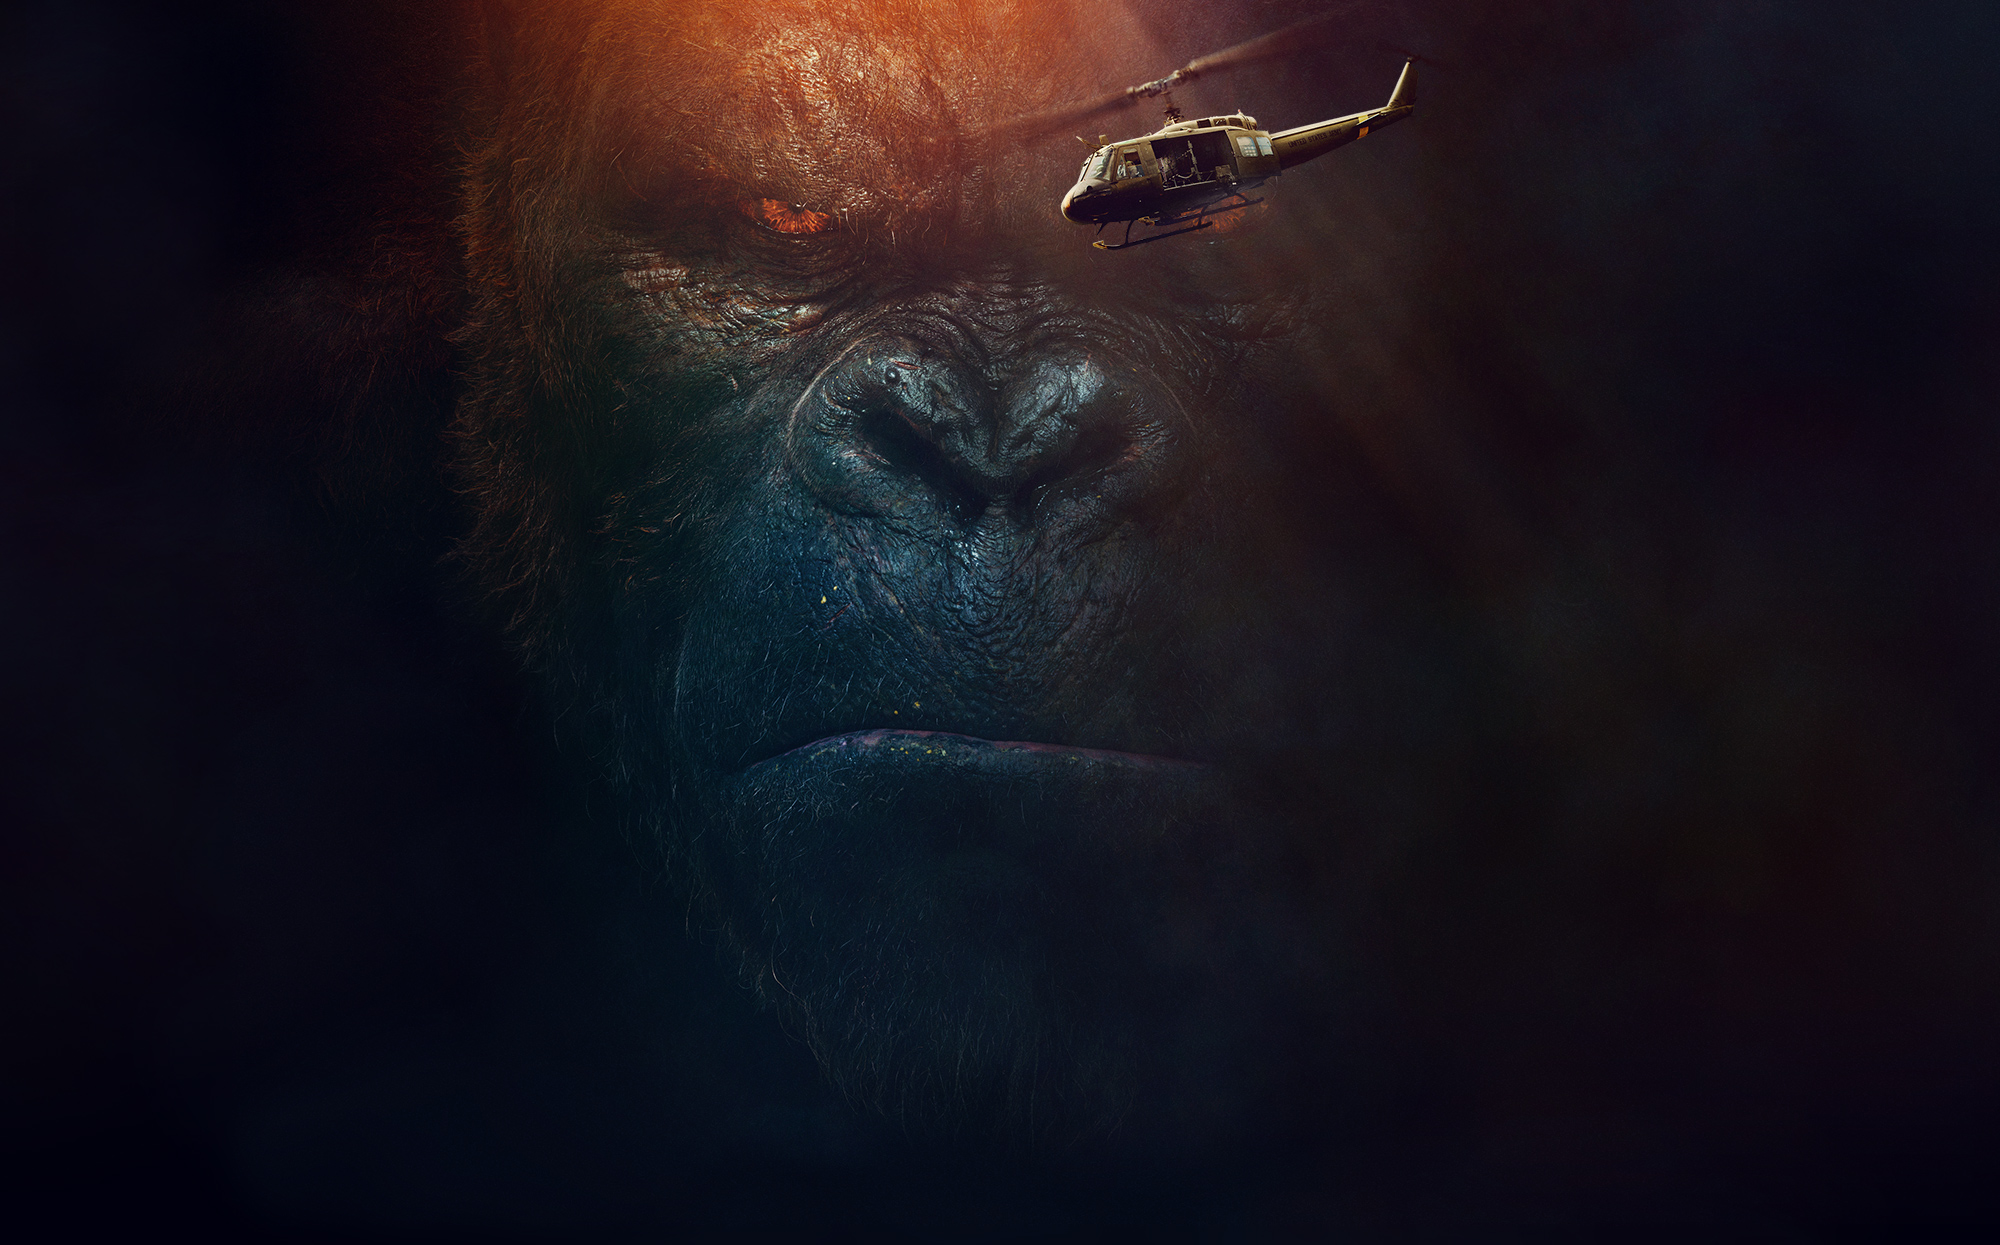 Gorilla Ape King Kong 2000x1245